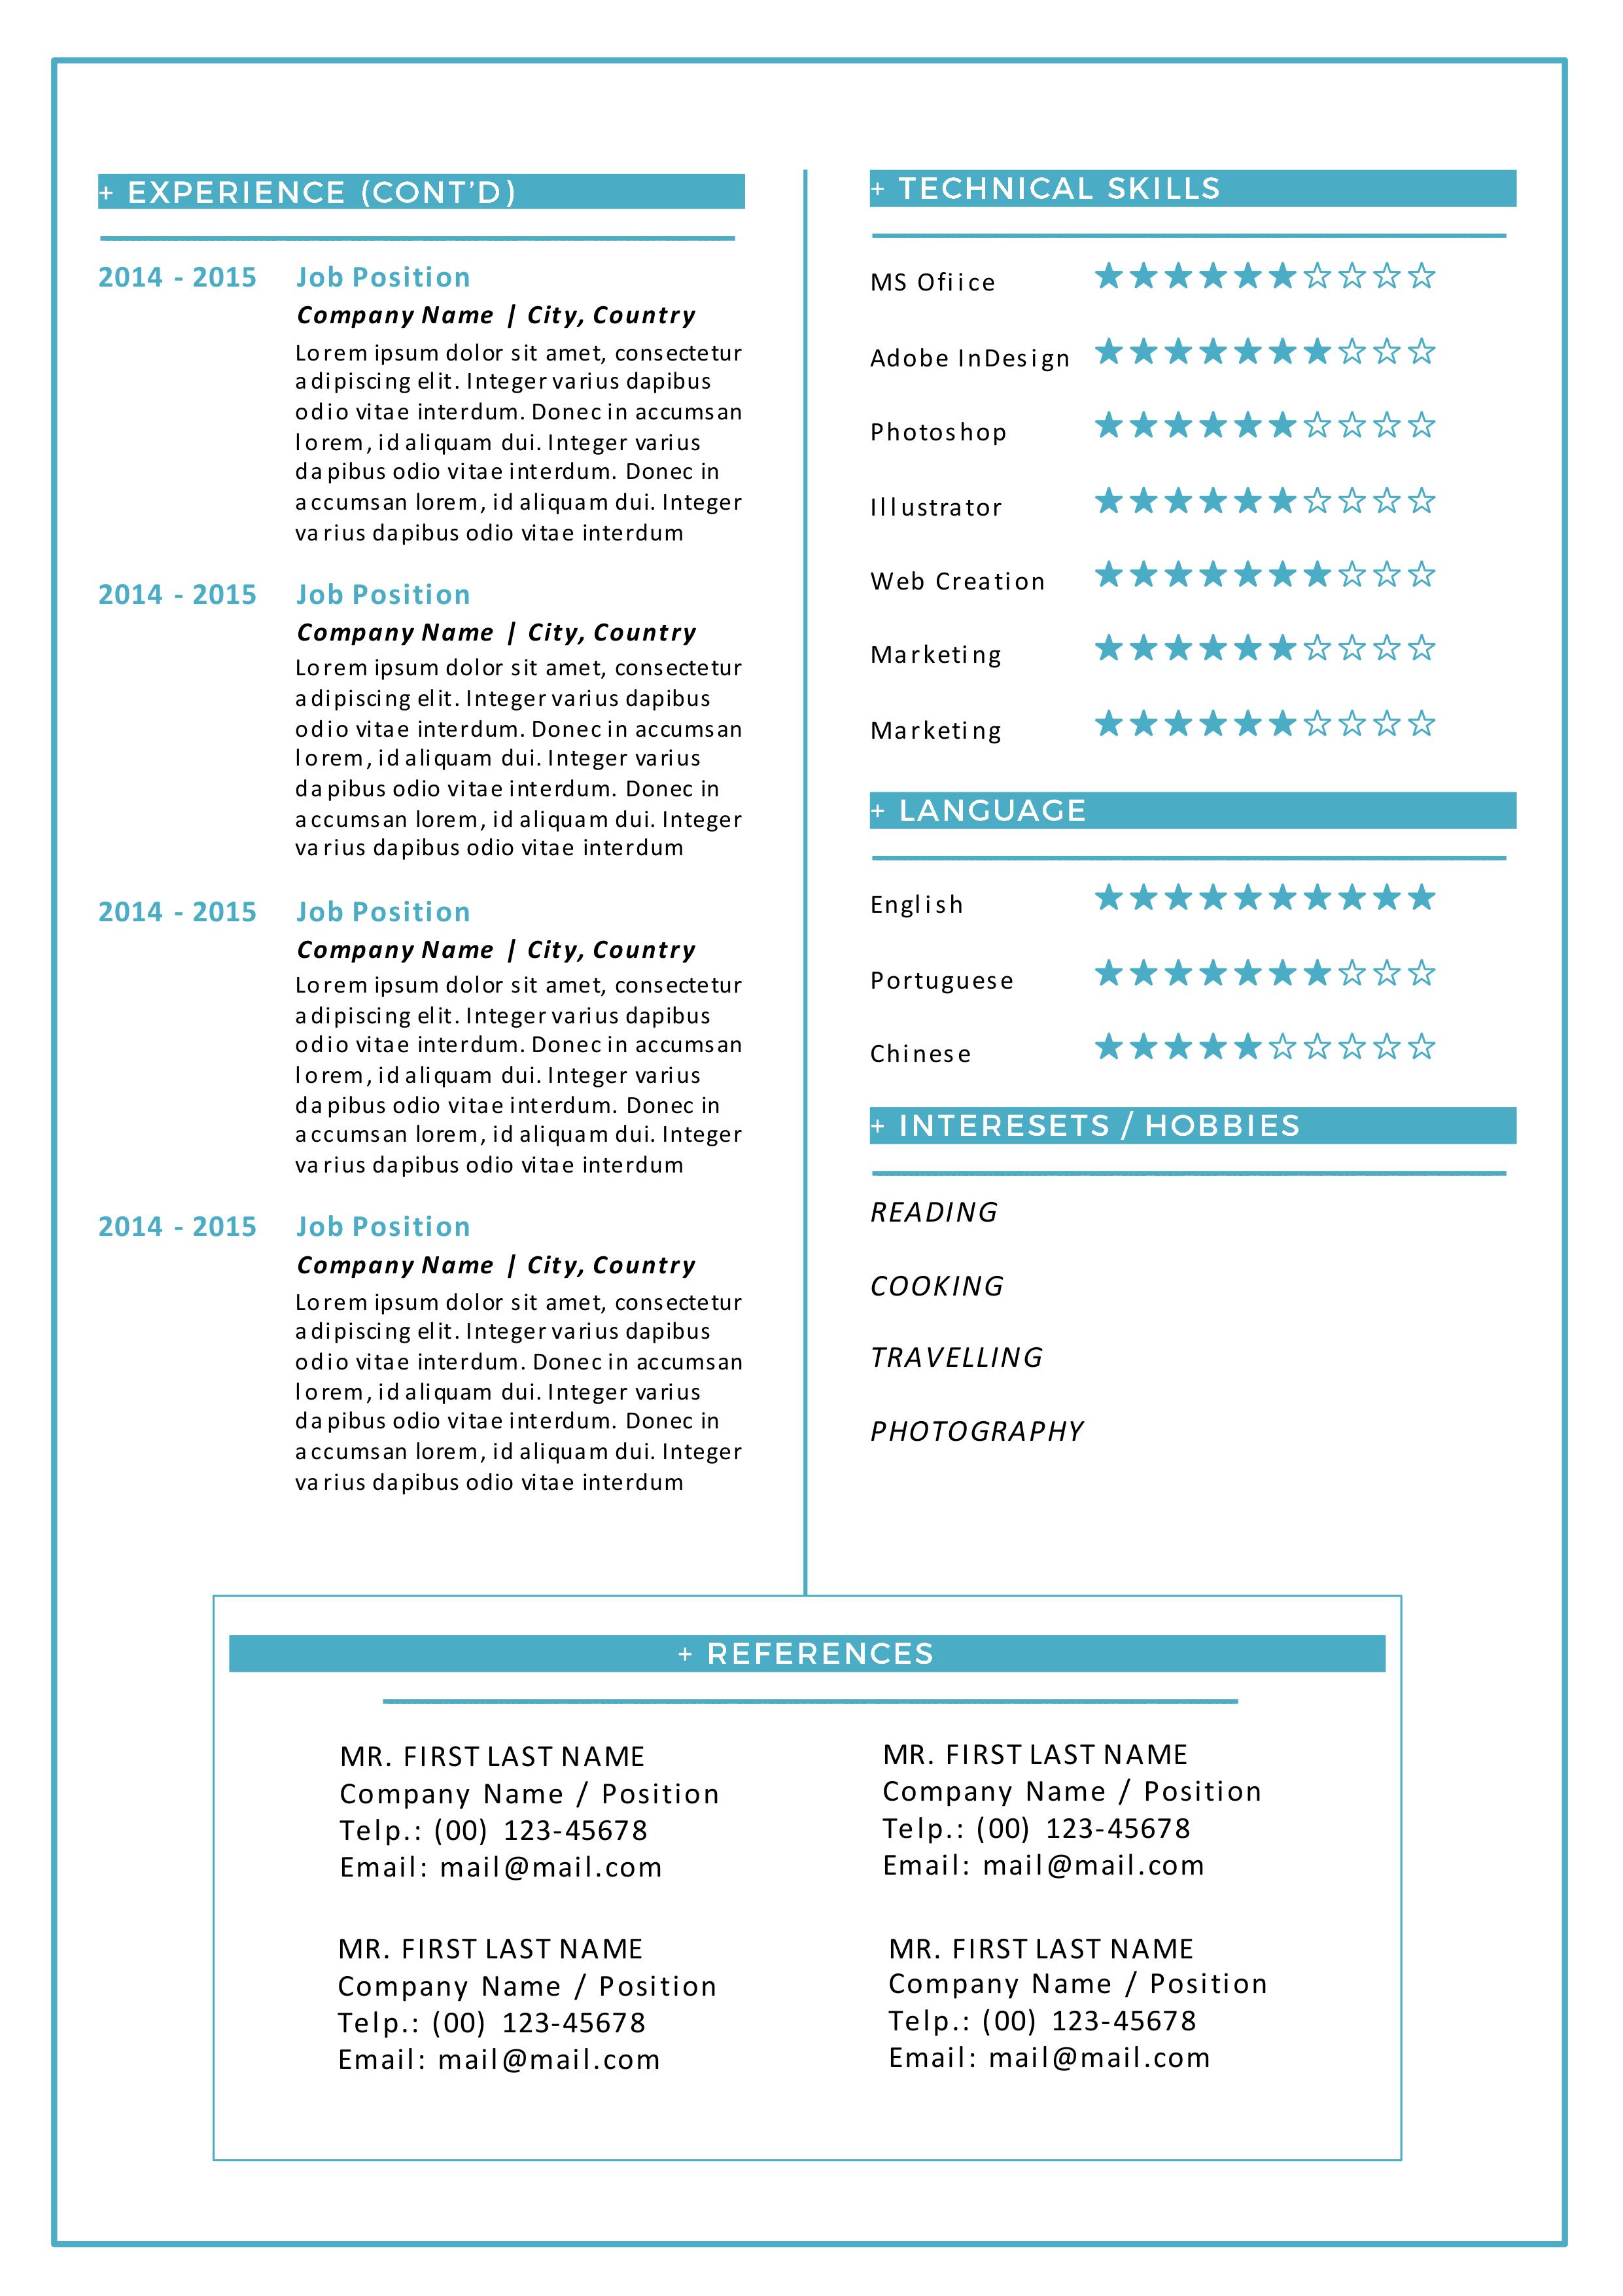 Sample cover letter for job resume sample retail cover letter modern resume templates docx to make recruiters awe psdkey cover letter cover letter cv sample for yelopaper Choice Image